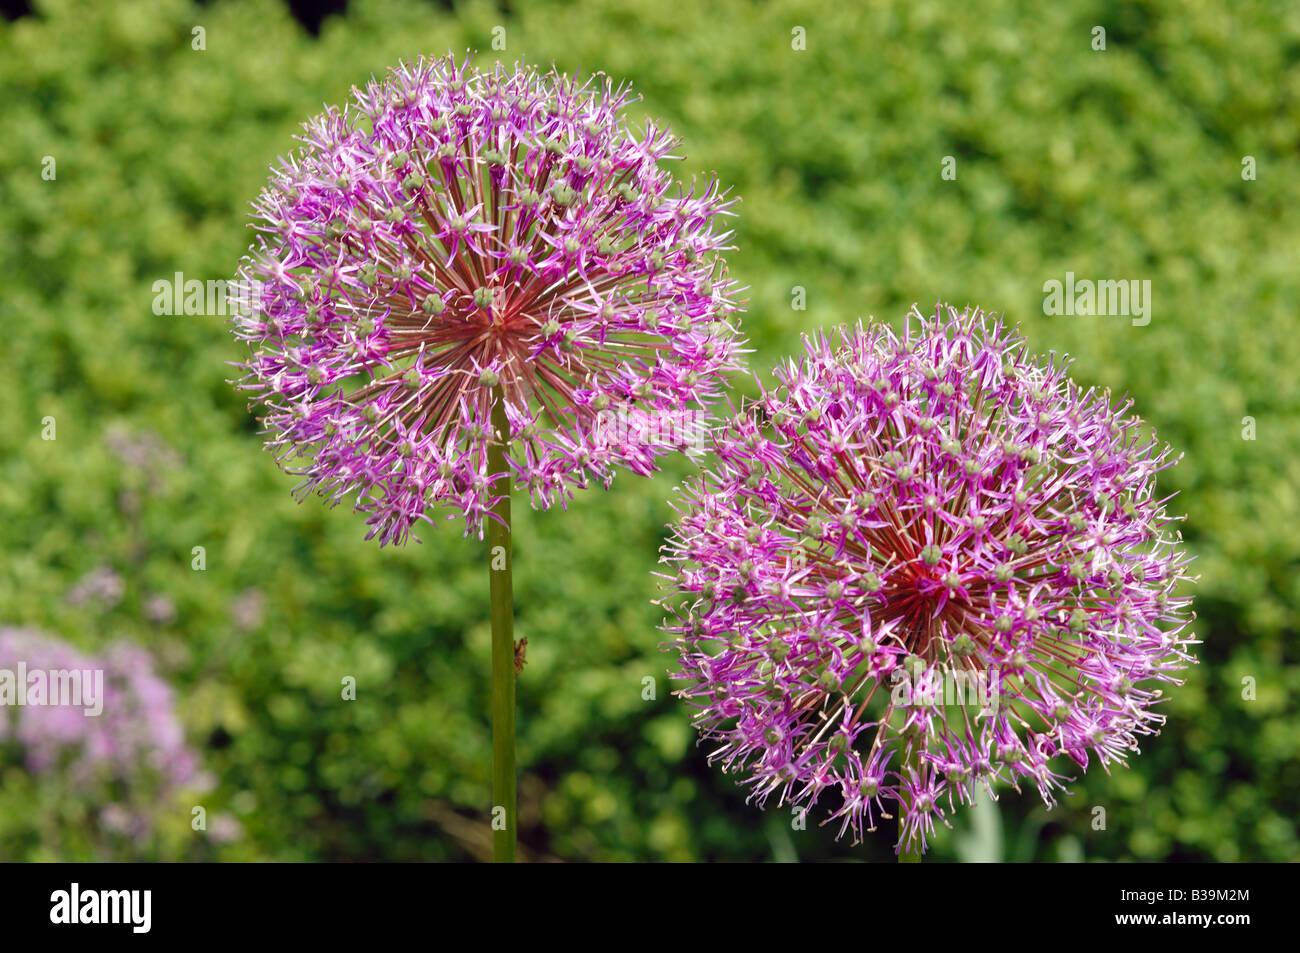 Pink flowers growing at Manito Park in Spokane, Washington State, USA - Stock Image